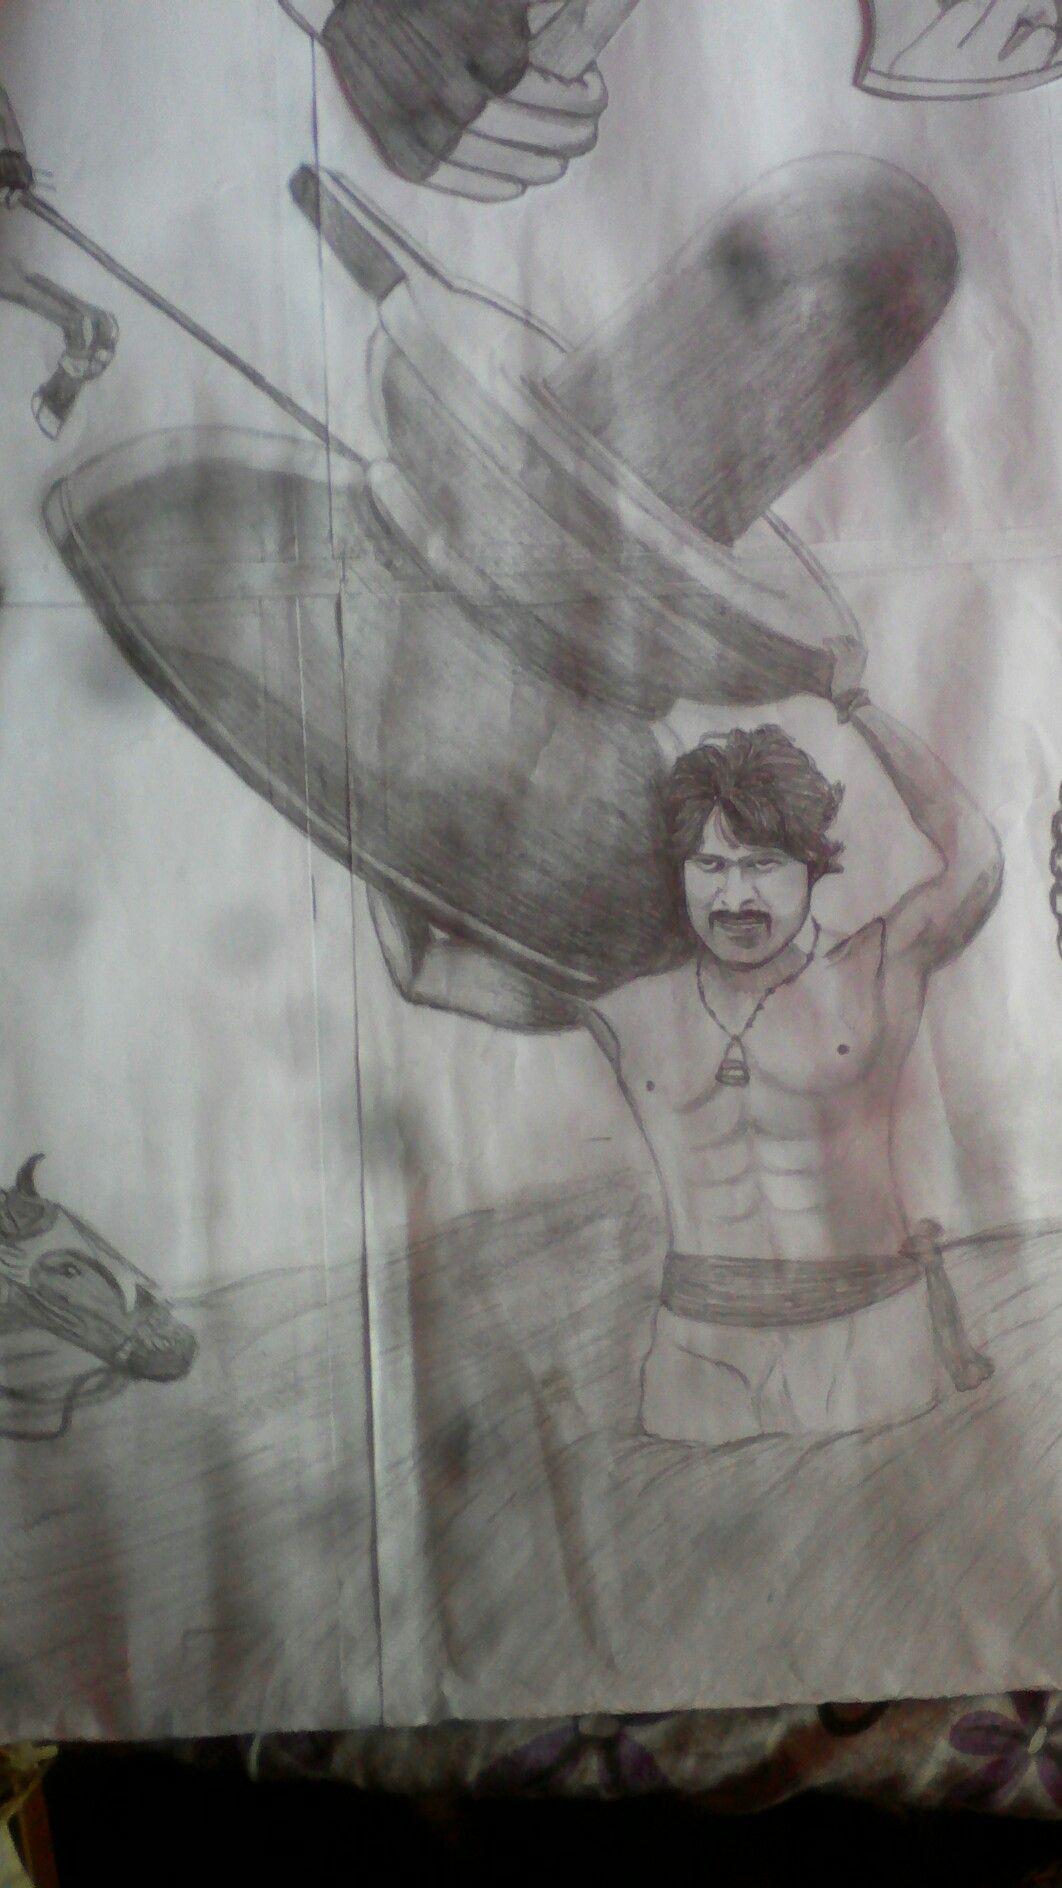 Bahubali2 drawing bahubali 2